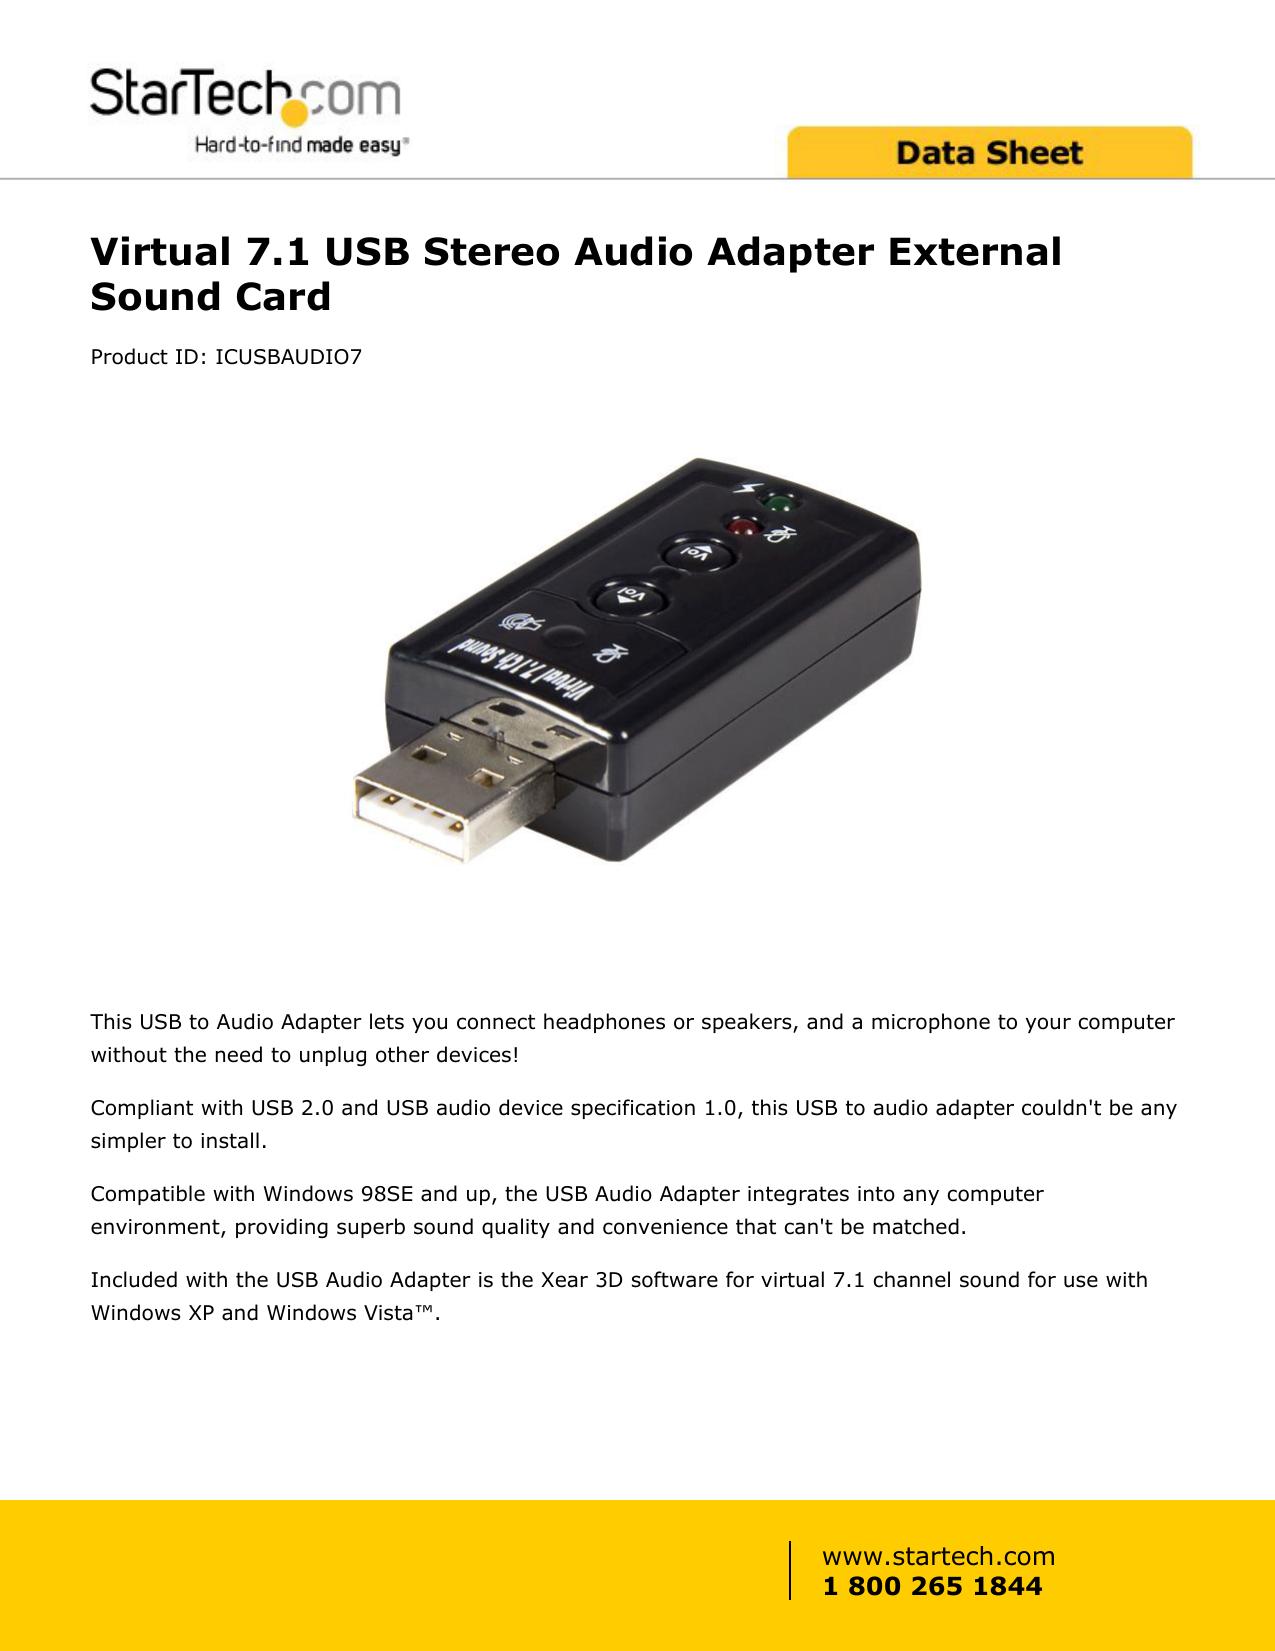 C MEDIA CM108 XEAR 3D VIRTUAL 7.1 USB AUDIO DRIVER FOR PC